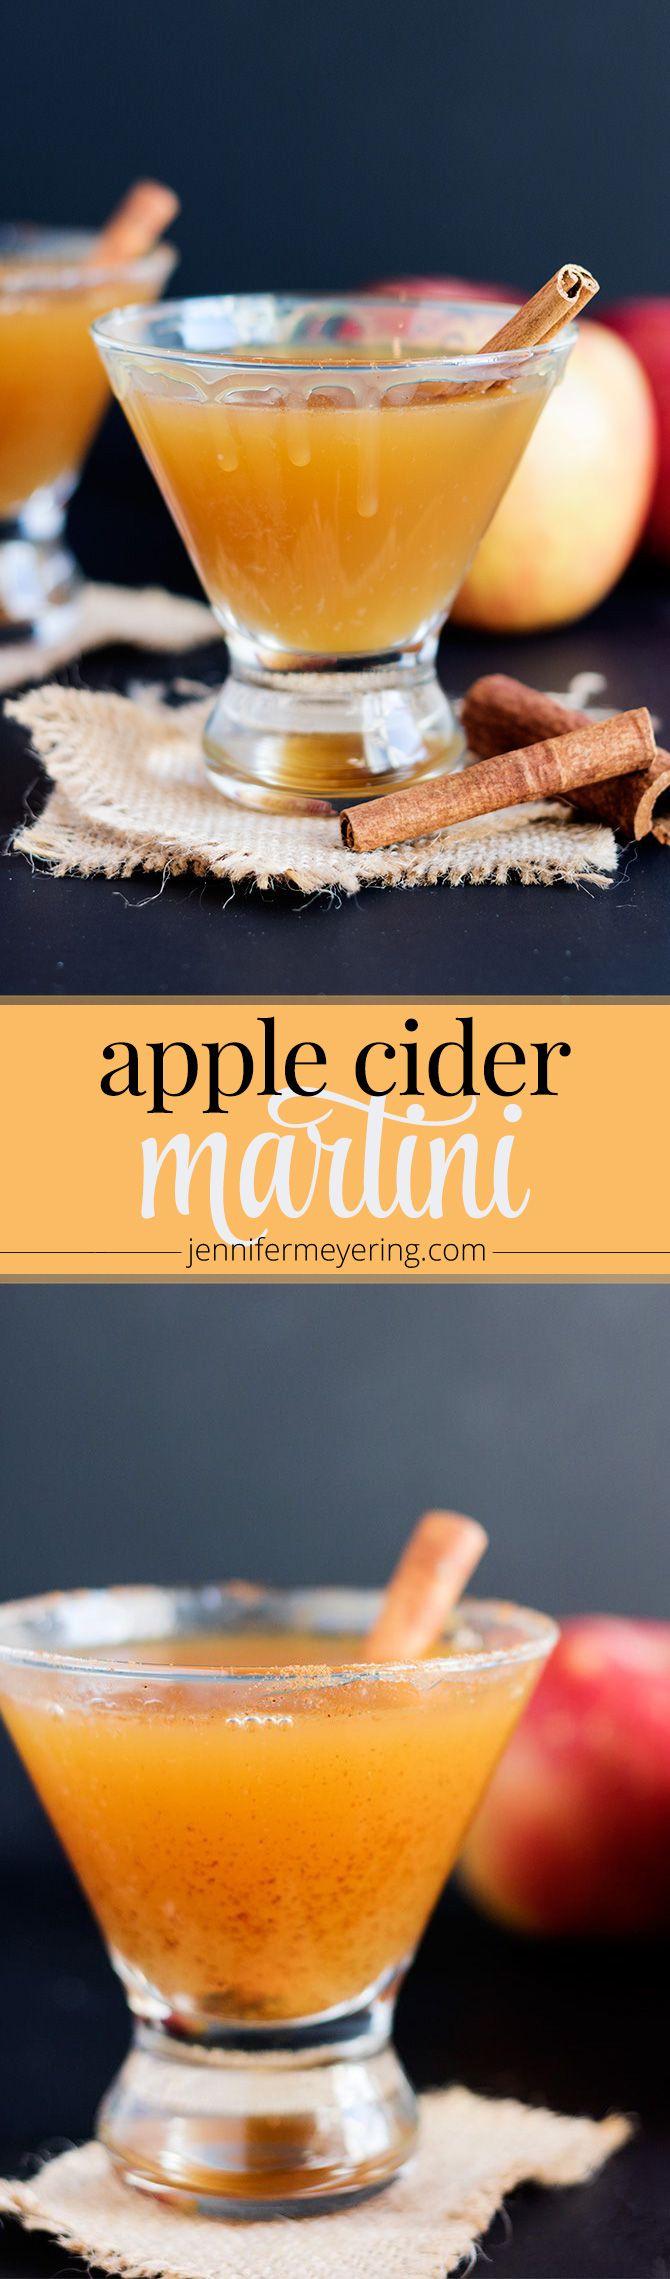 Apple Cider Martini - JenniferMeyering.com